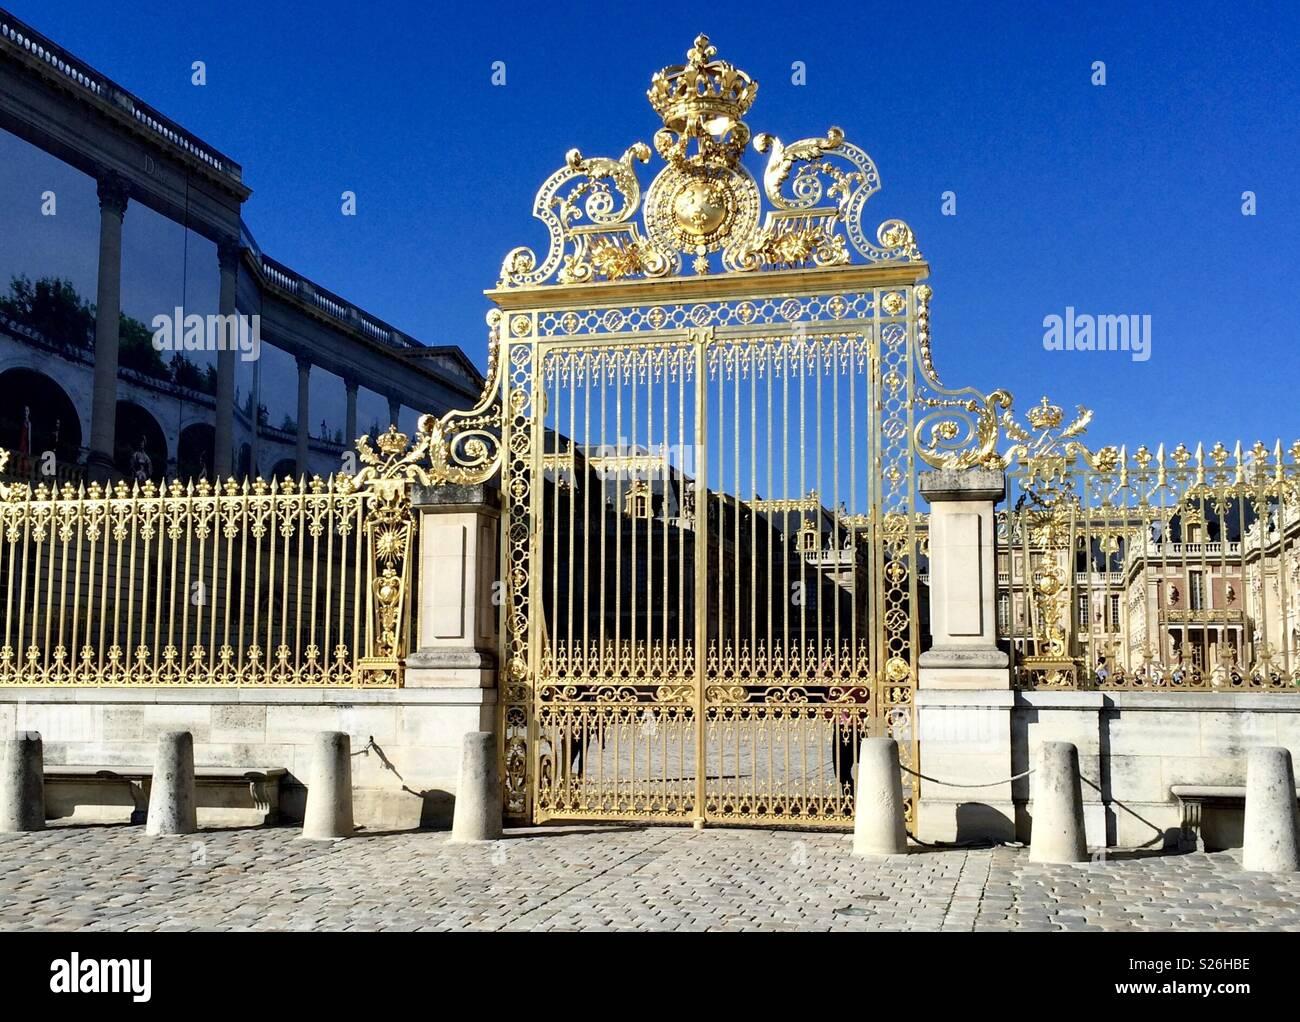 Palace of Versailles - Stock Image